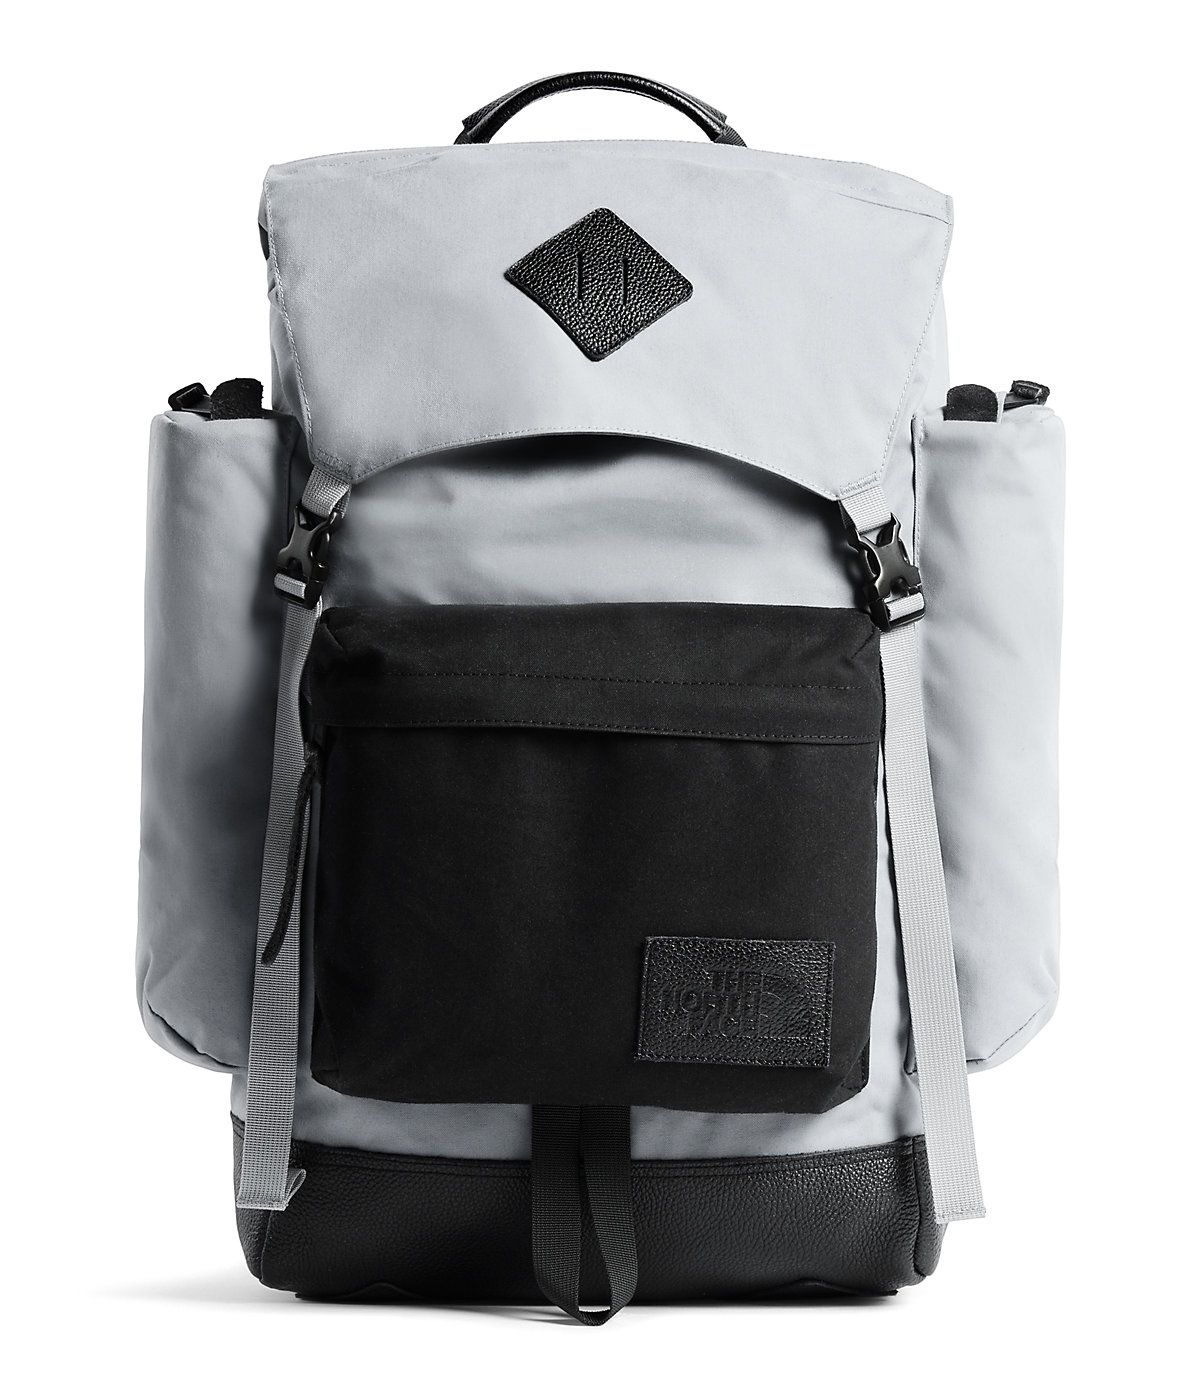 f3ba99418 Premium rucksack backpack in 2019 | Products | Backpacks, Rucksack ...